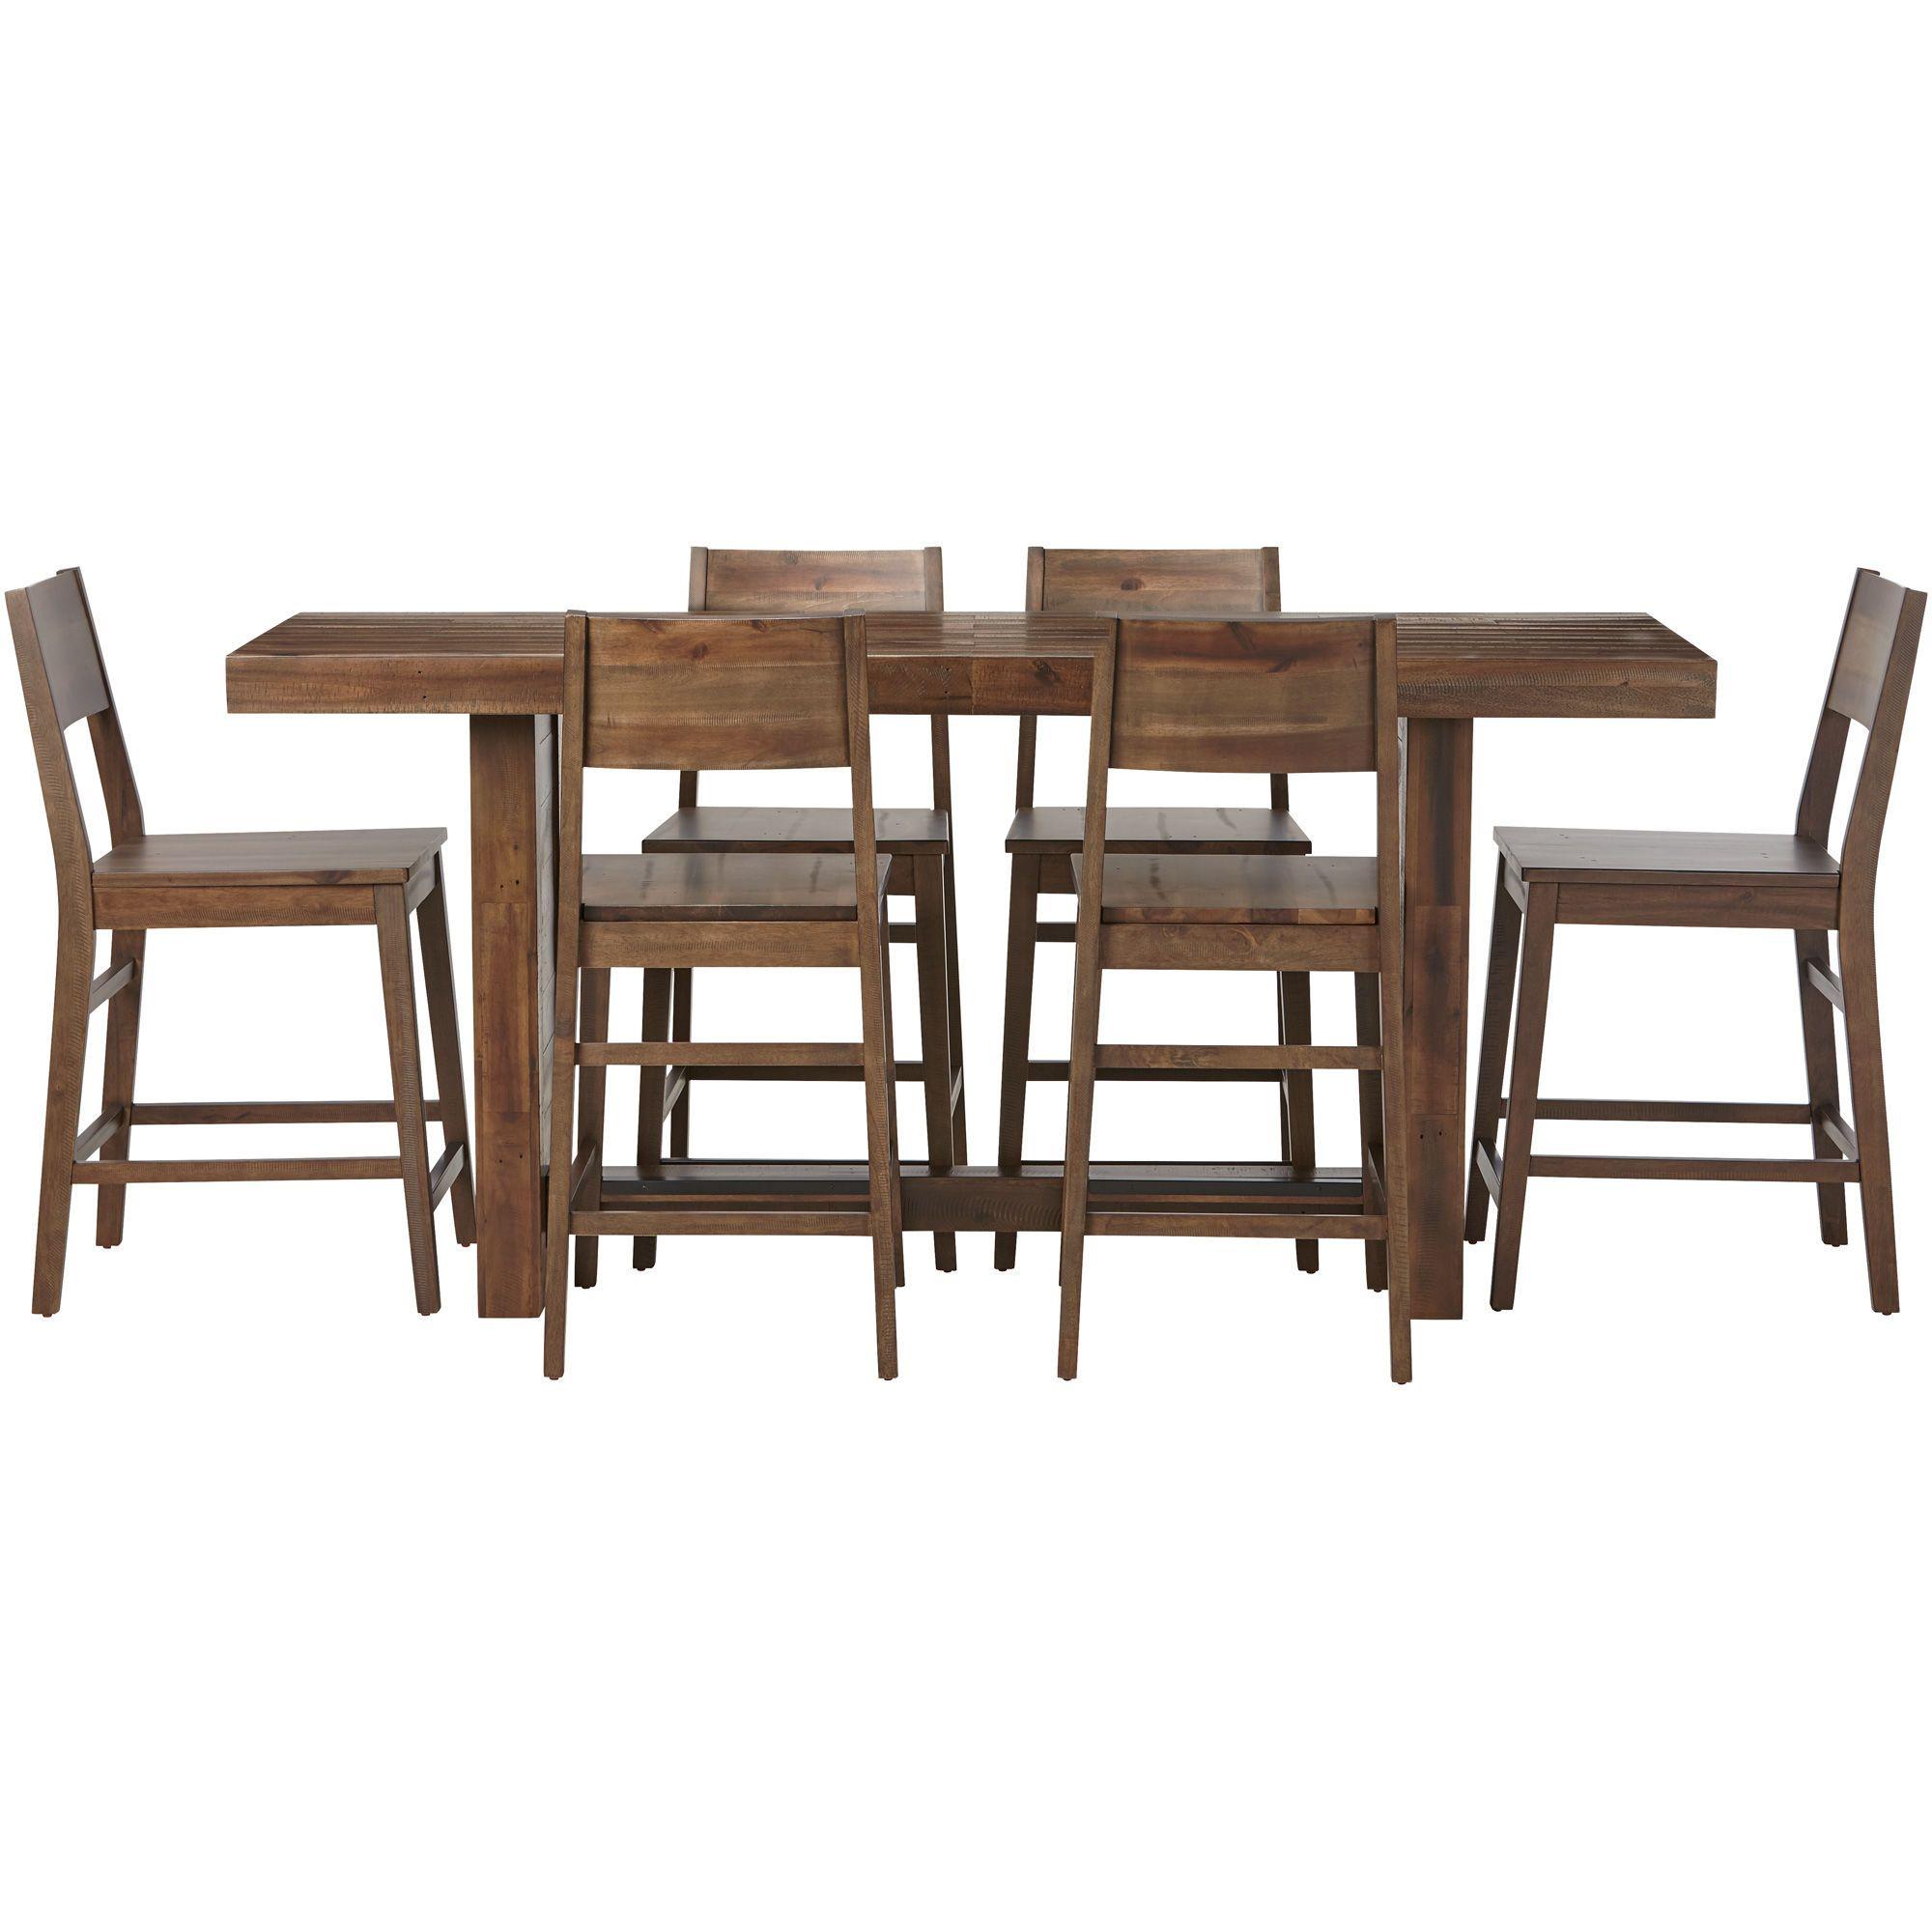 Slumberland Furniture Rye 5 Piece Rustic Gray Counter Height Dining Set Counter Height Dining Sets Dining Set Counter Height Stools